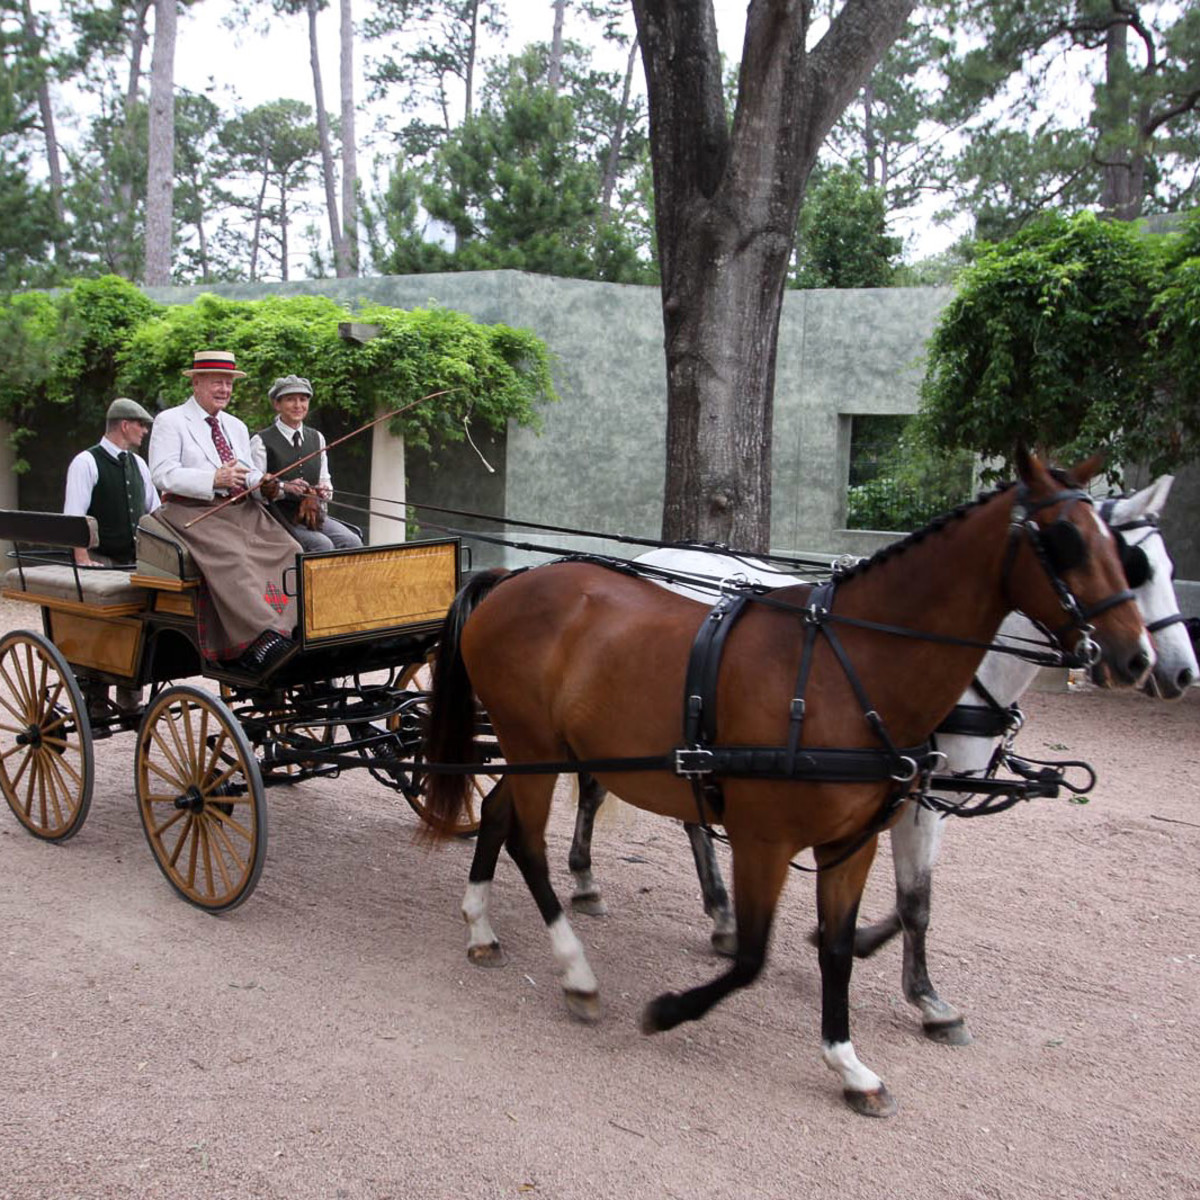 News_Park party_Stewart Morris_horses_carriage